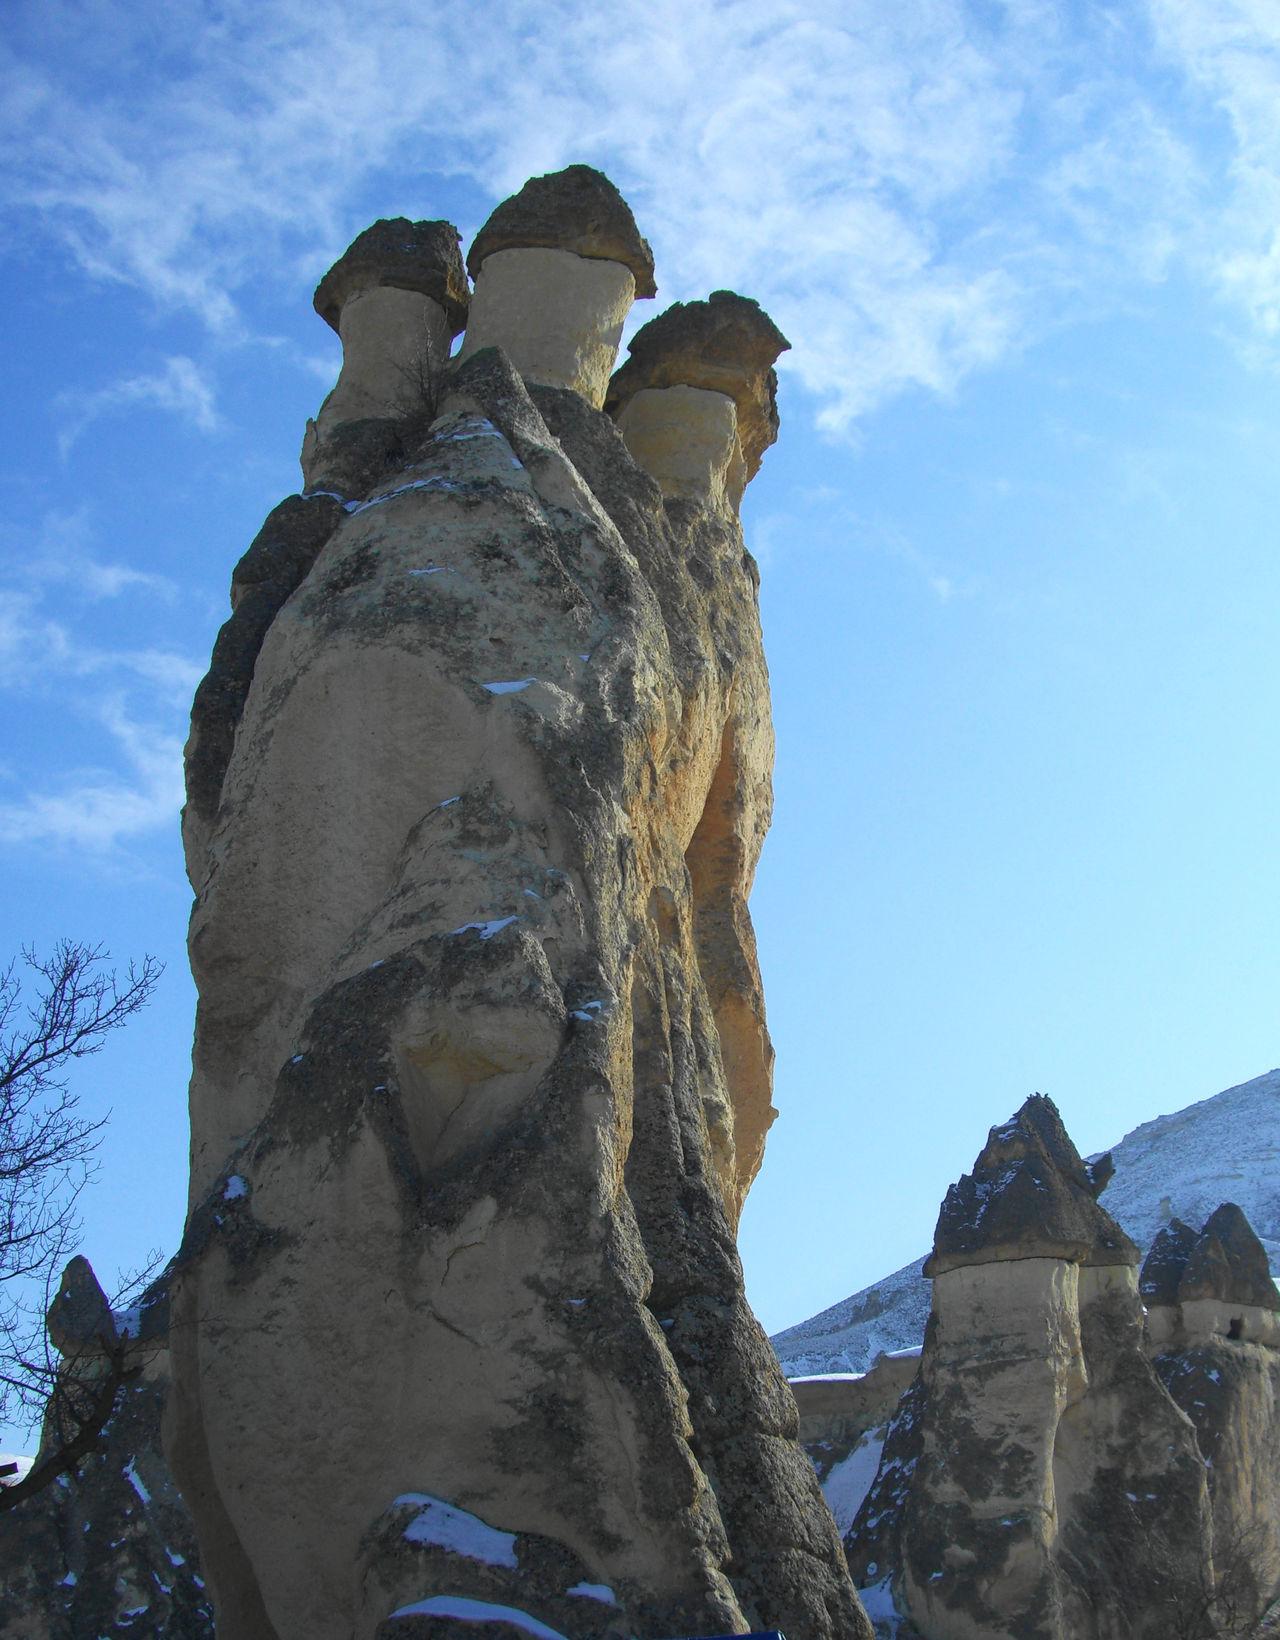 Moshroom Mountain Nature Outdoors Rock Sky Turkey きのこ岩 トルコ 2006